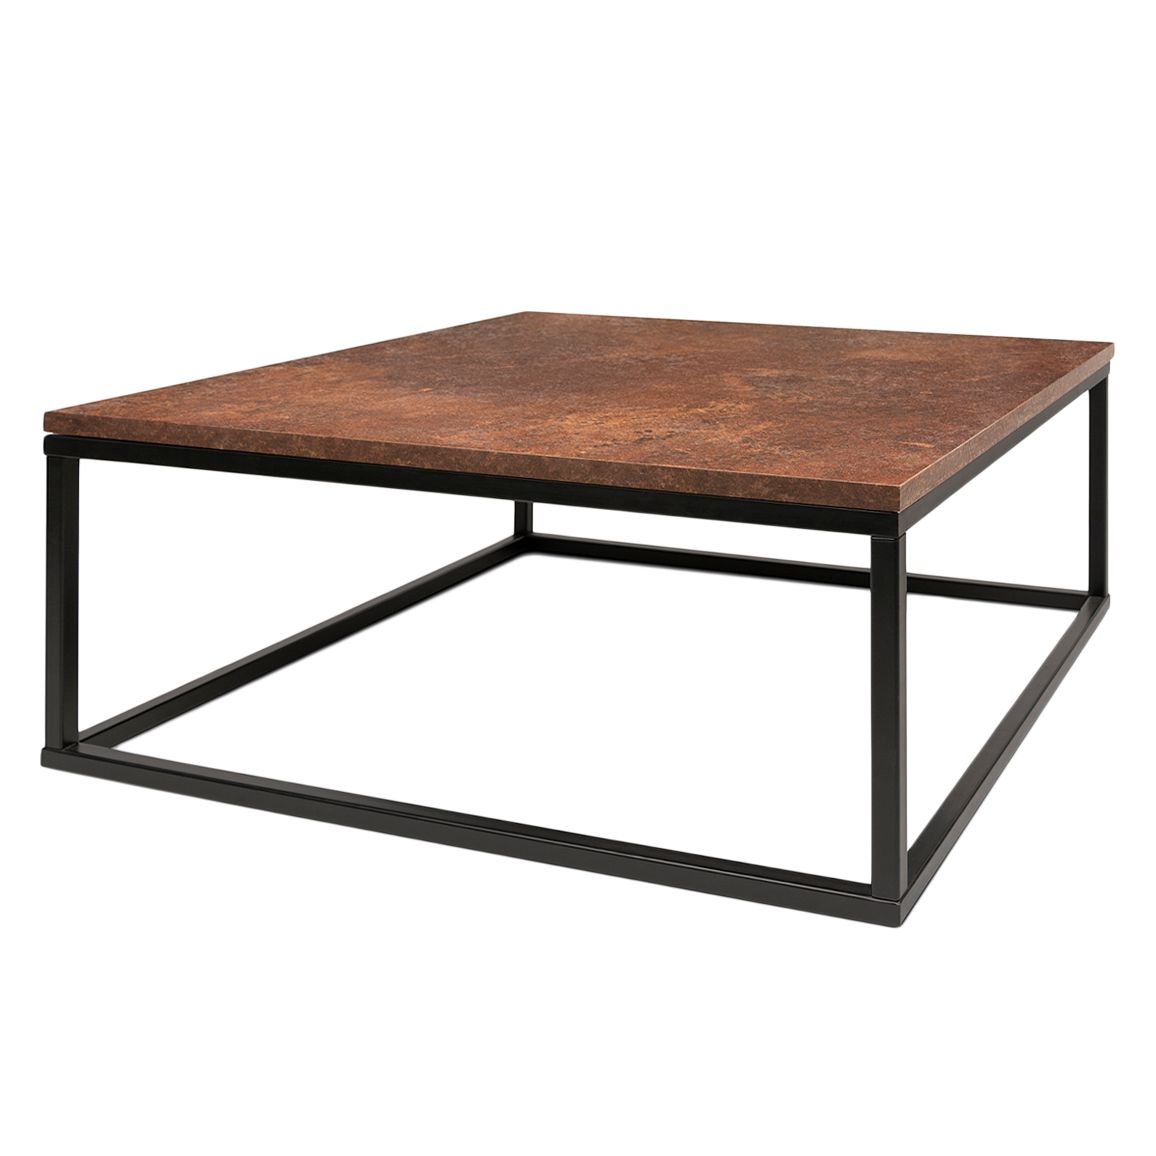 Table basse Fountain - Marron / Noir, ars manufacti